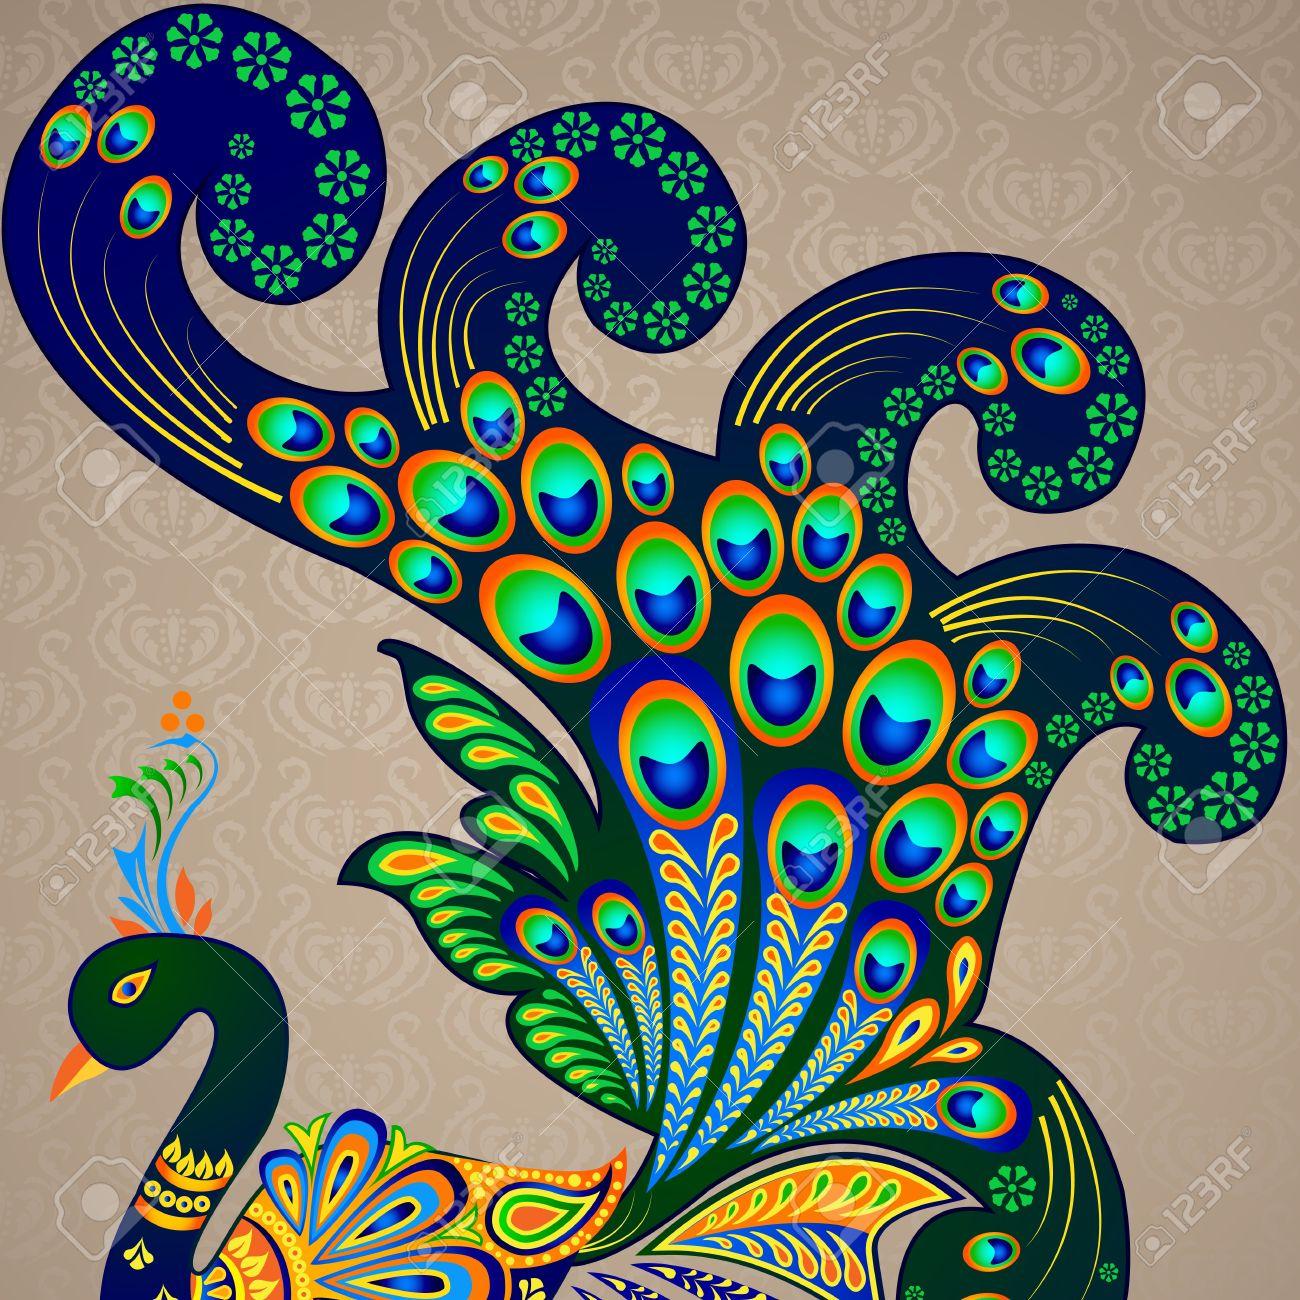 عم تتحدث الصور عن جمال الطاوس 20916021-Colorful-Decorated-Peacock-Stock-Vector-peacock-design-floral